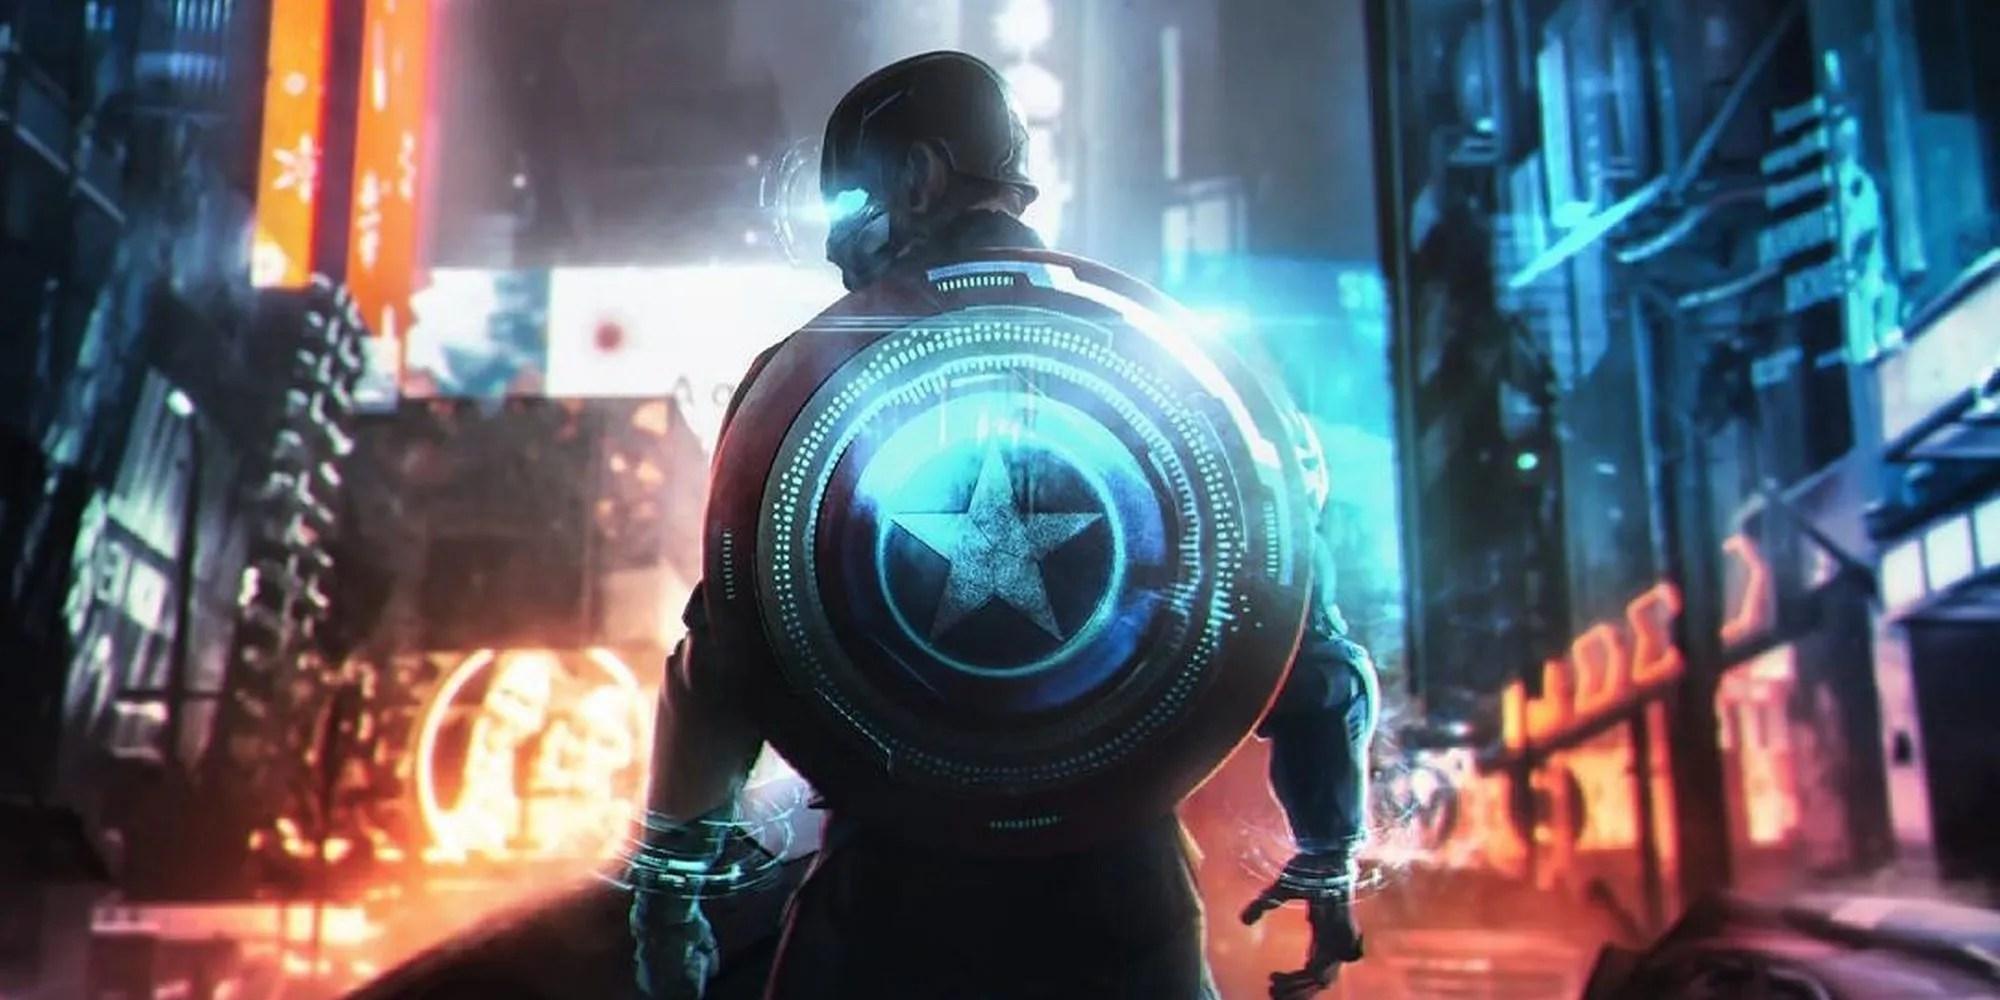 Fan Art Captain America Cyberpunk 2077 is the video game we deserve